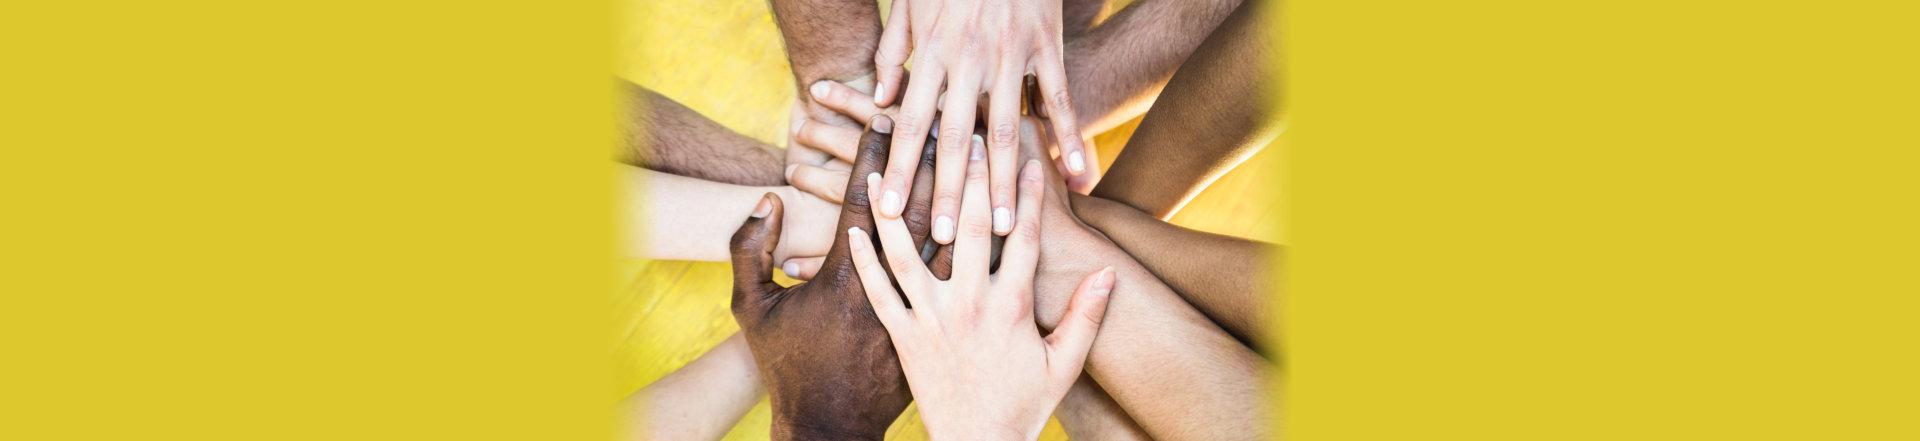 stacks of people hands